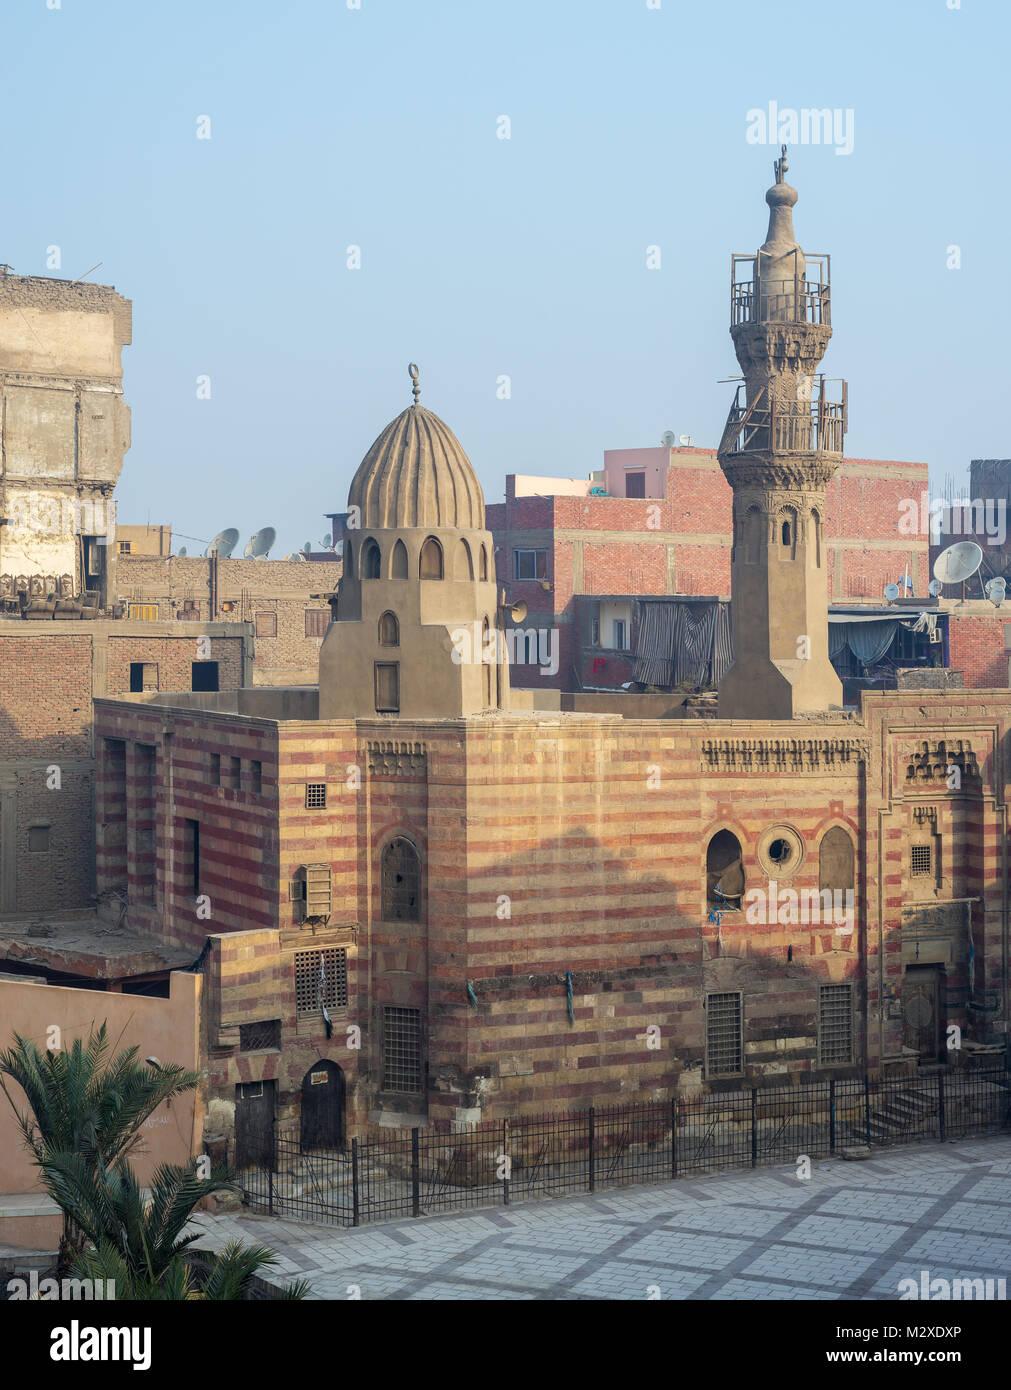 Cairo, Egypt - January 1, 2018: Exterior facade of Jawhar al-Lala mosque - Stock Image